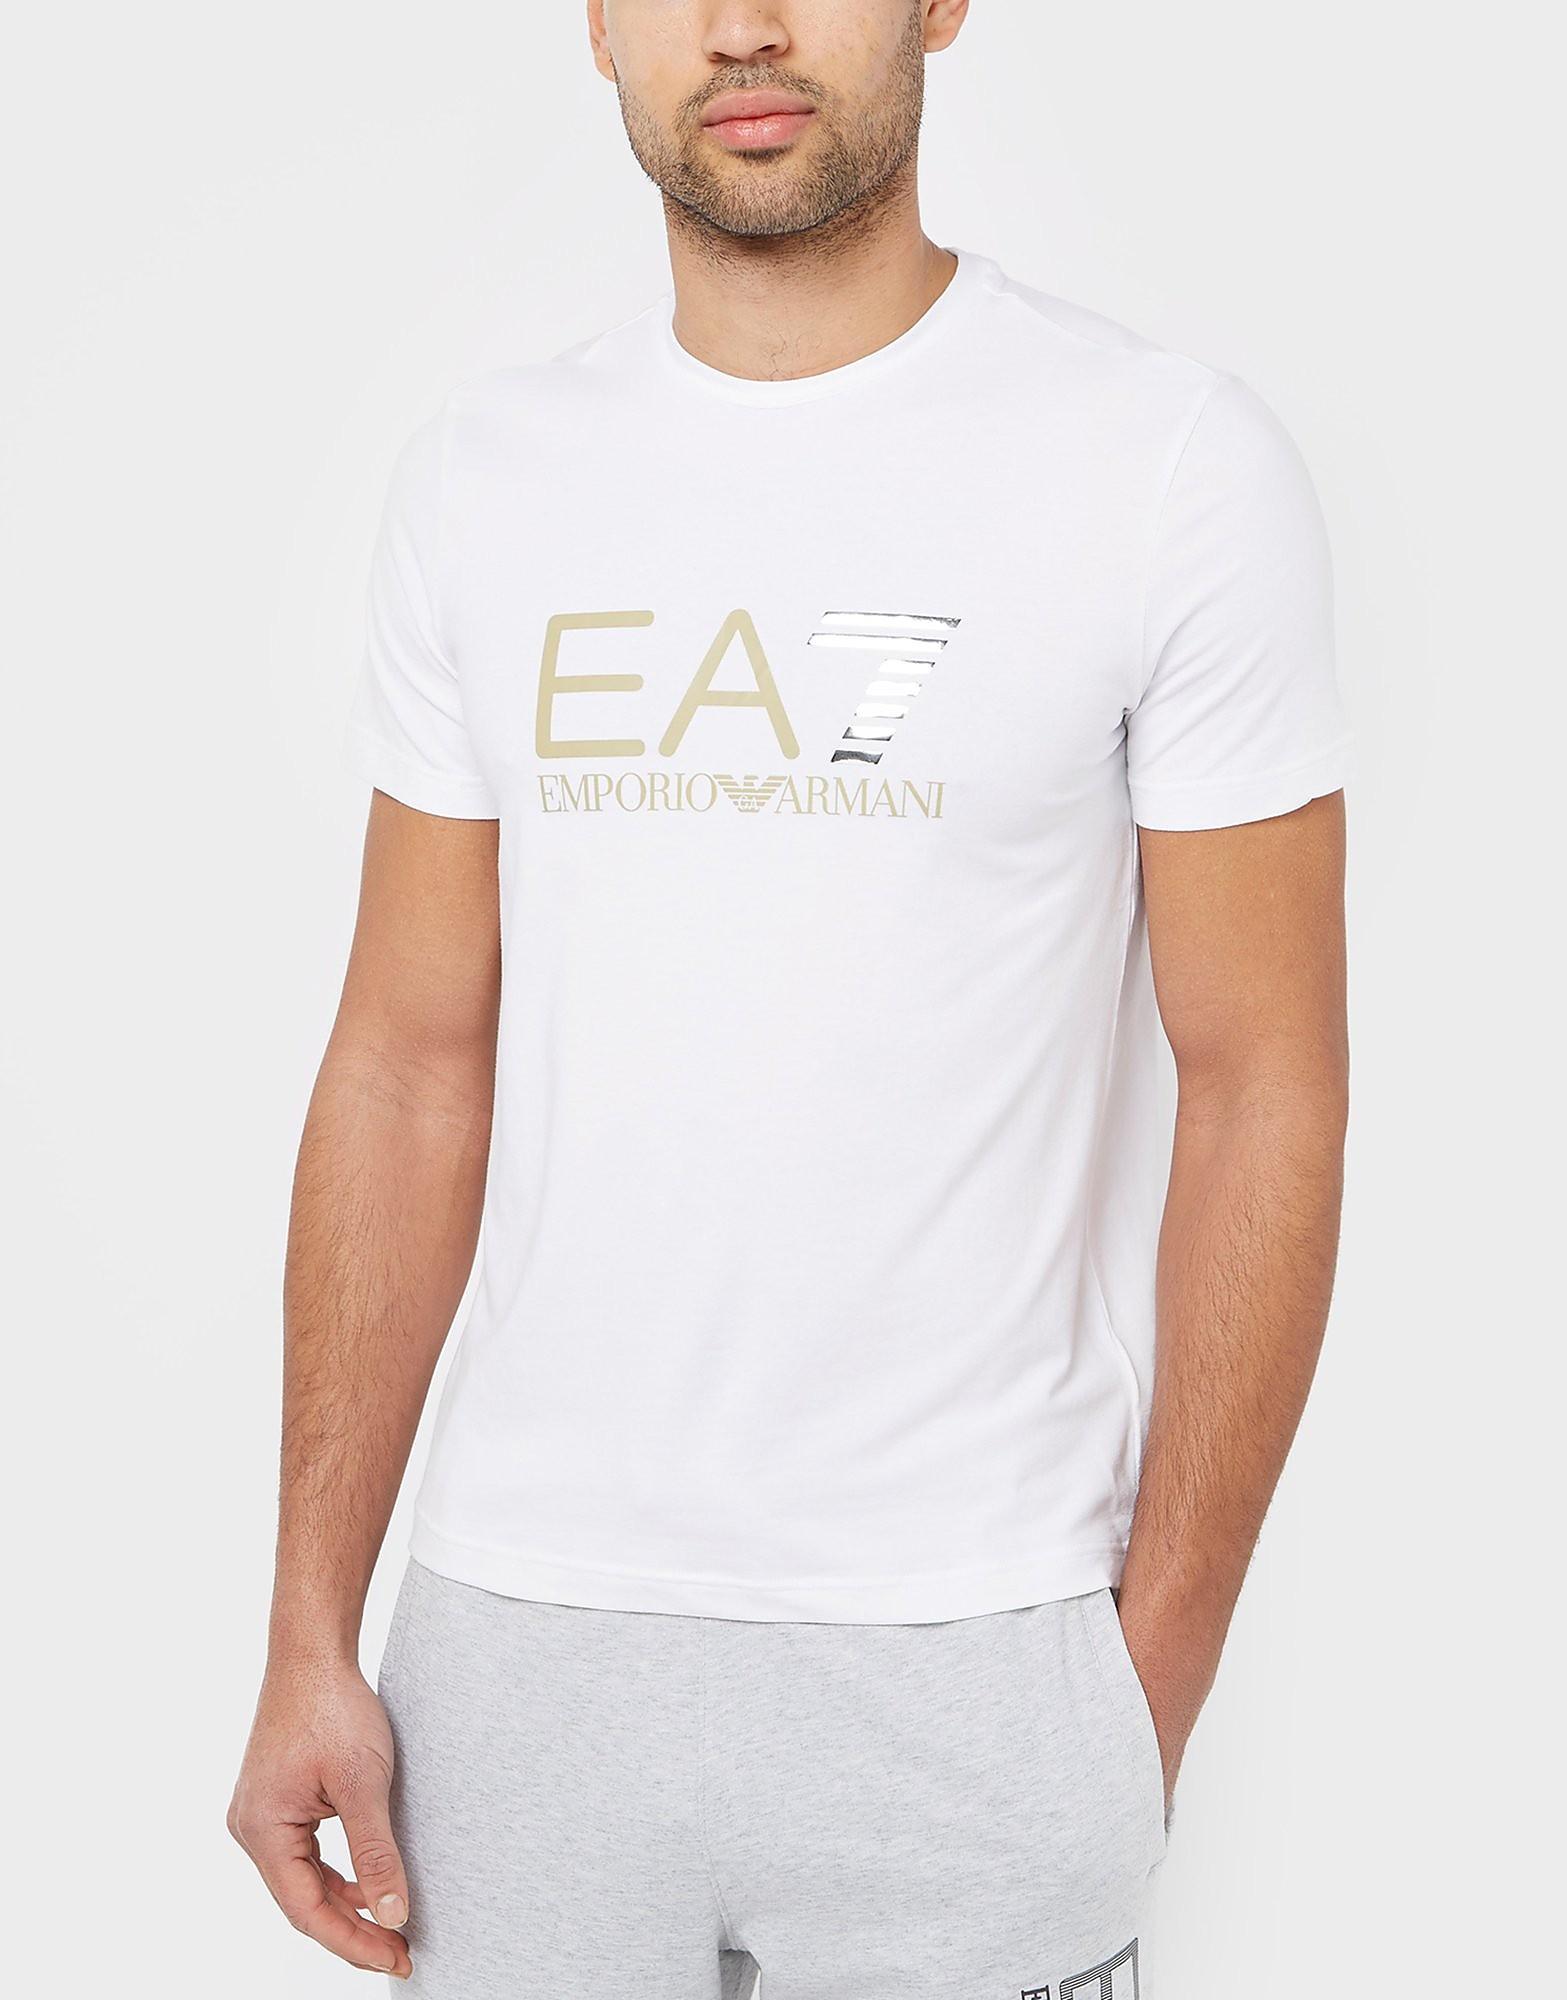 Emporio Armani EA7 Foil Logo T-Shirt